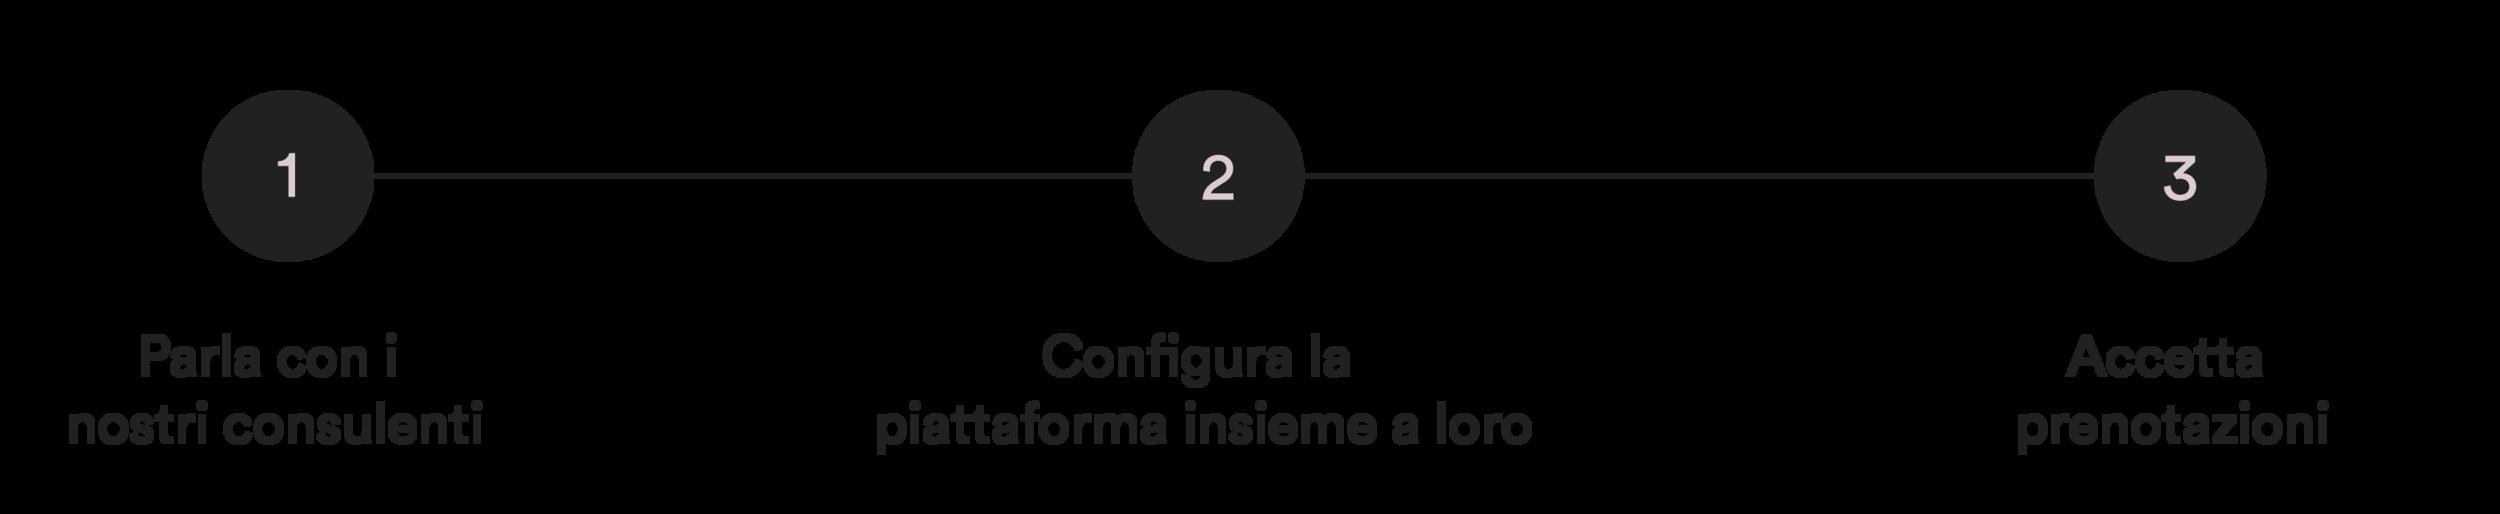 steps_web-01.png